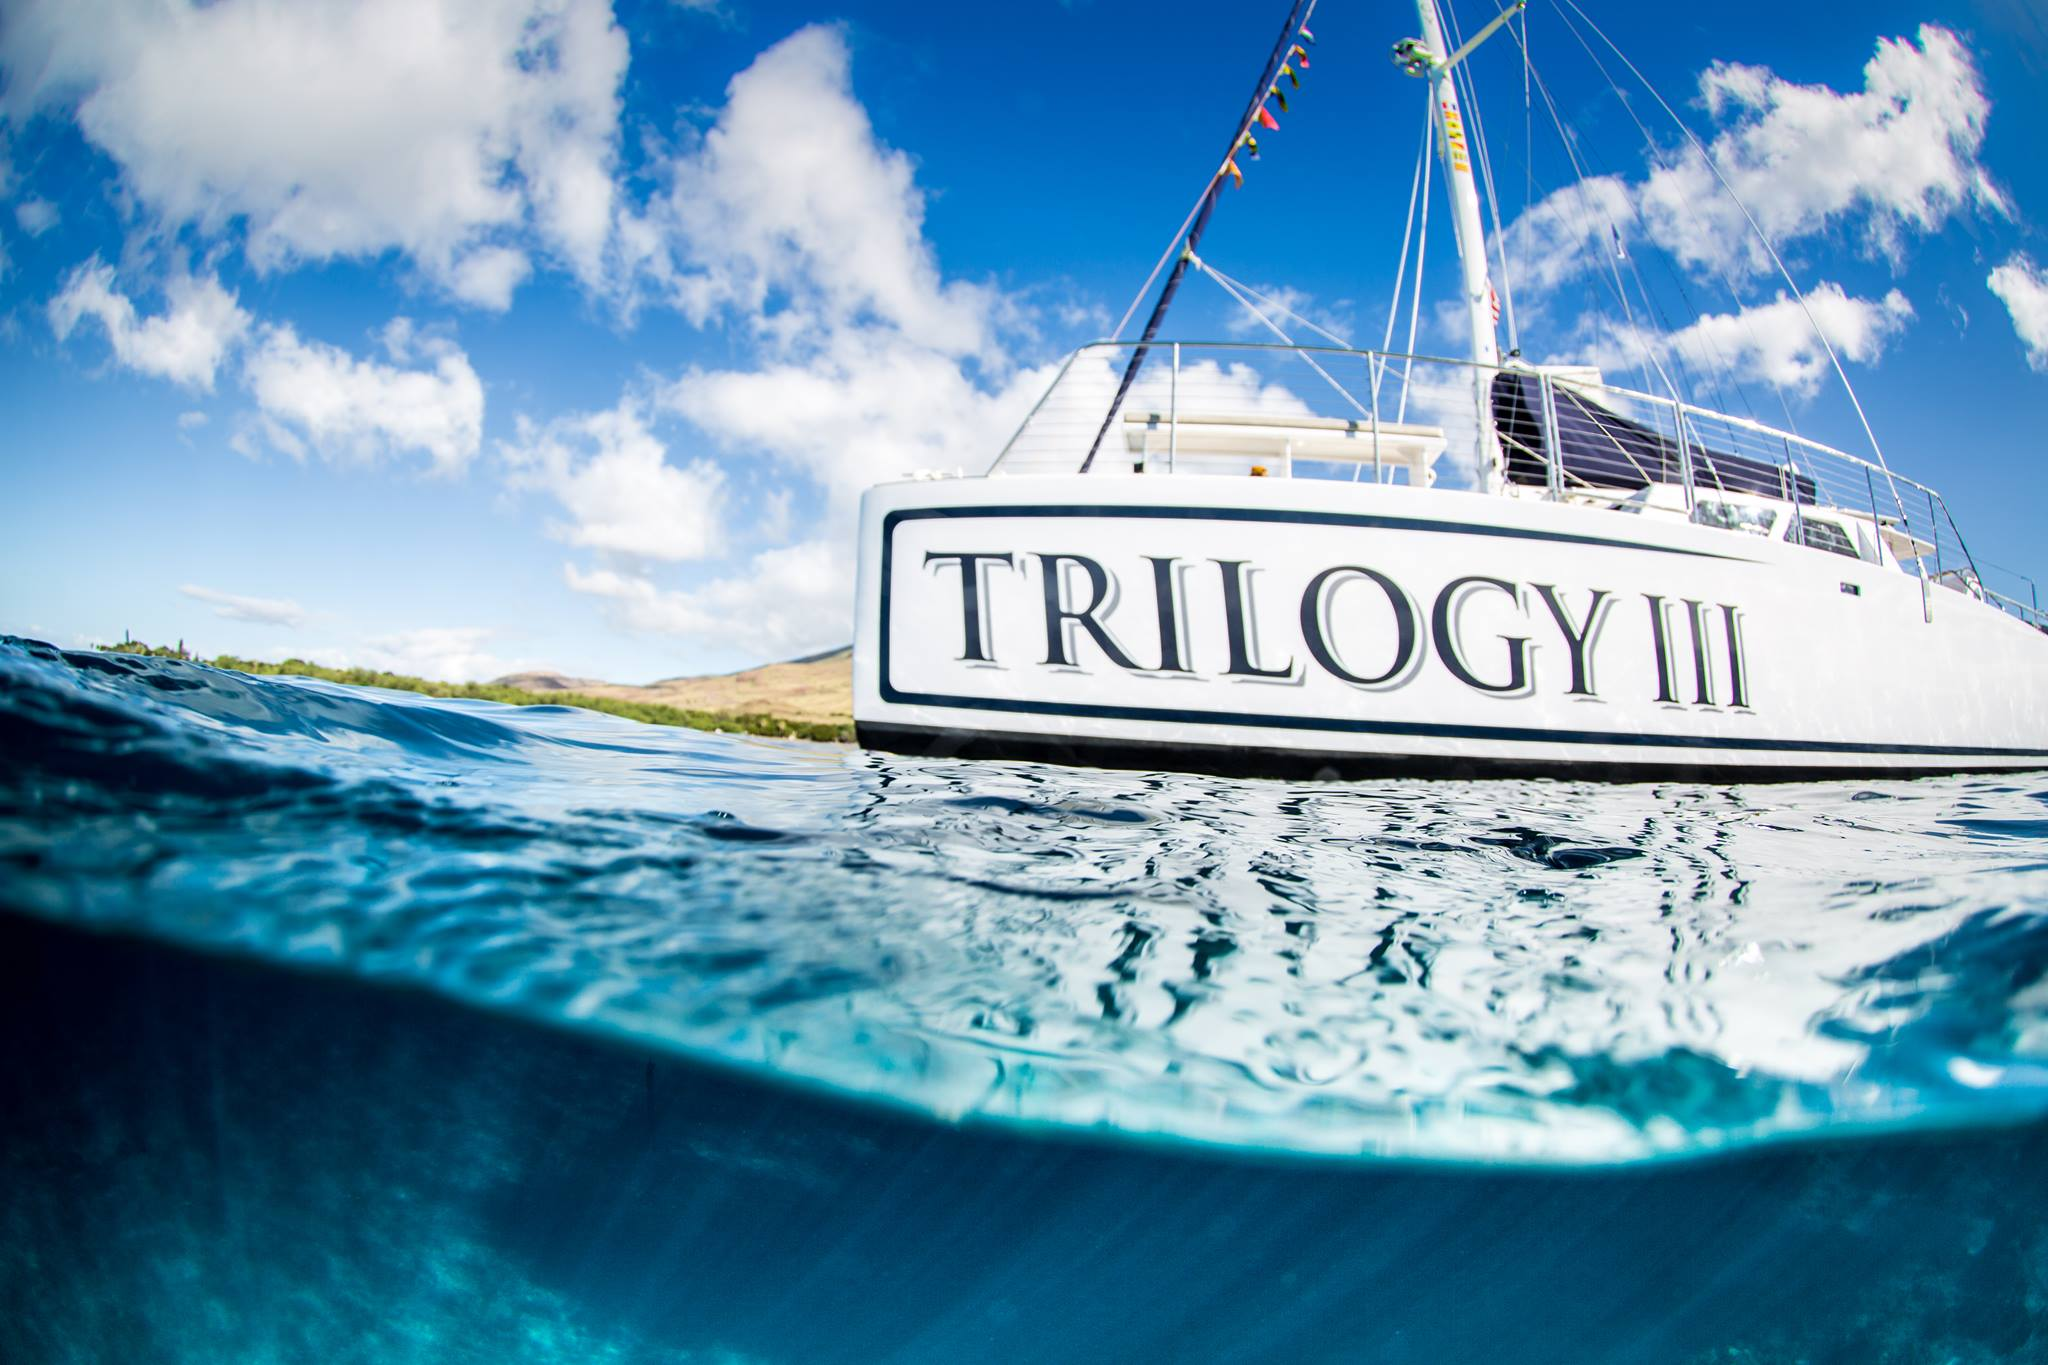 Trilogy_Kaanapali.jpg